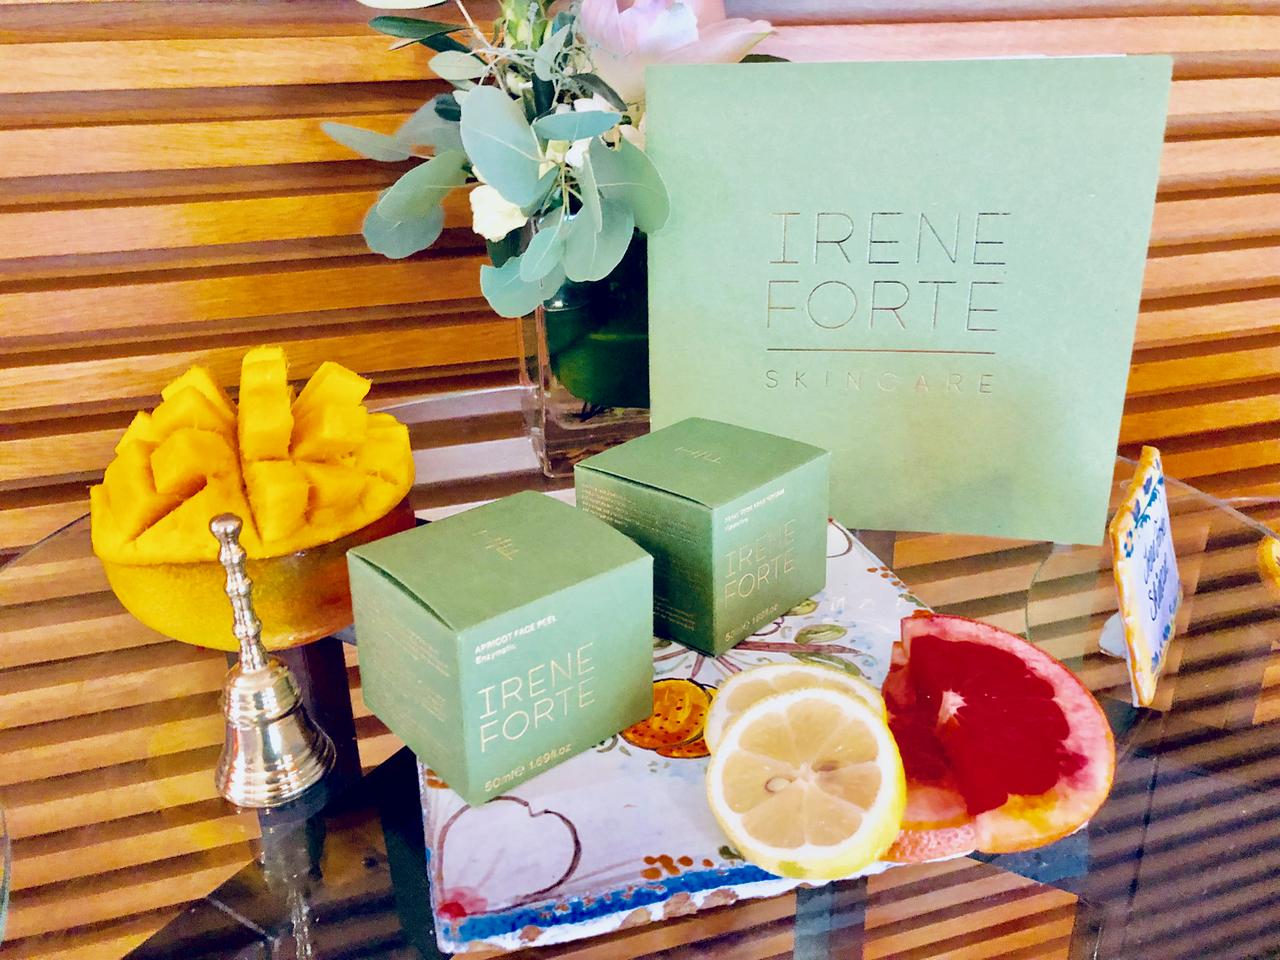 Irene Forte Skin Care